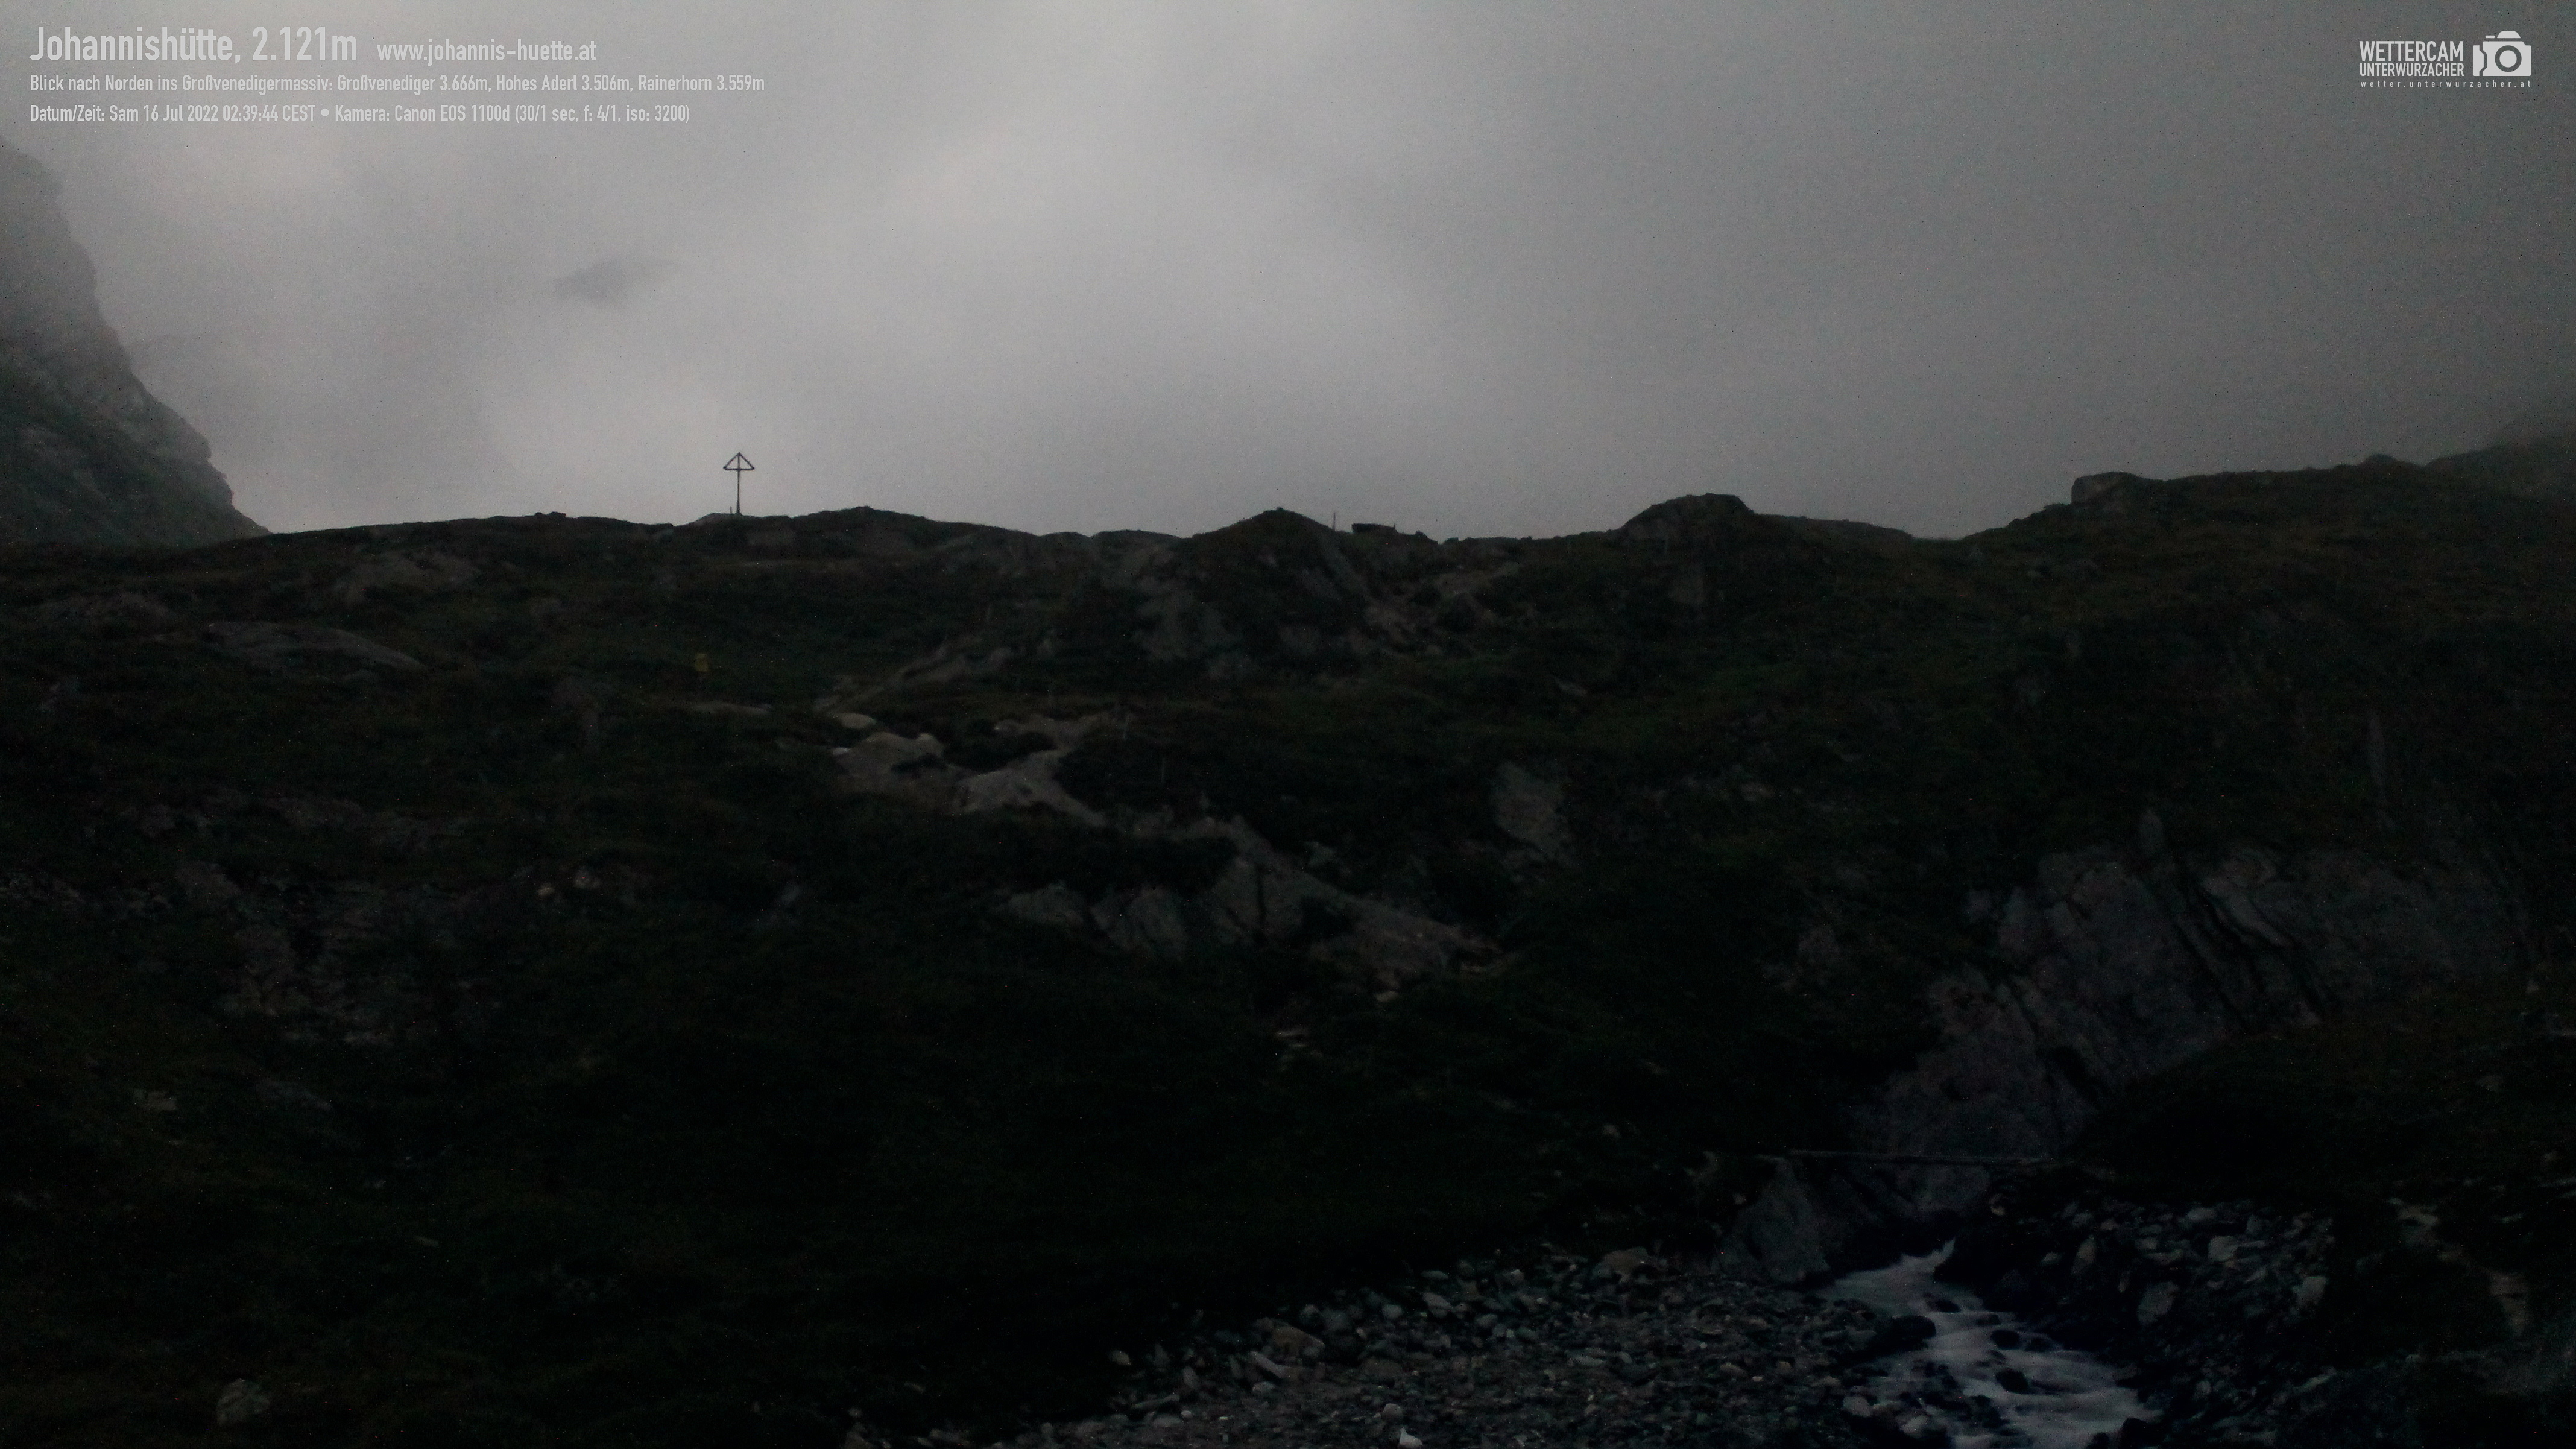 Webcam Johannis-Hütte 2.121 m | Venedigergruppe in Osttirol